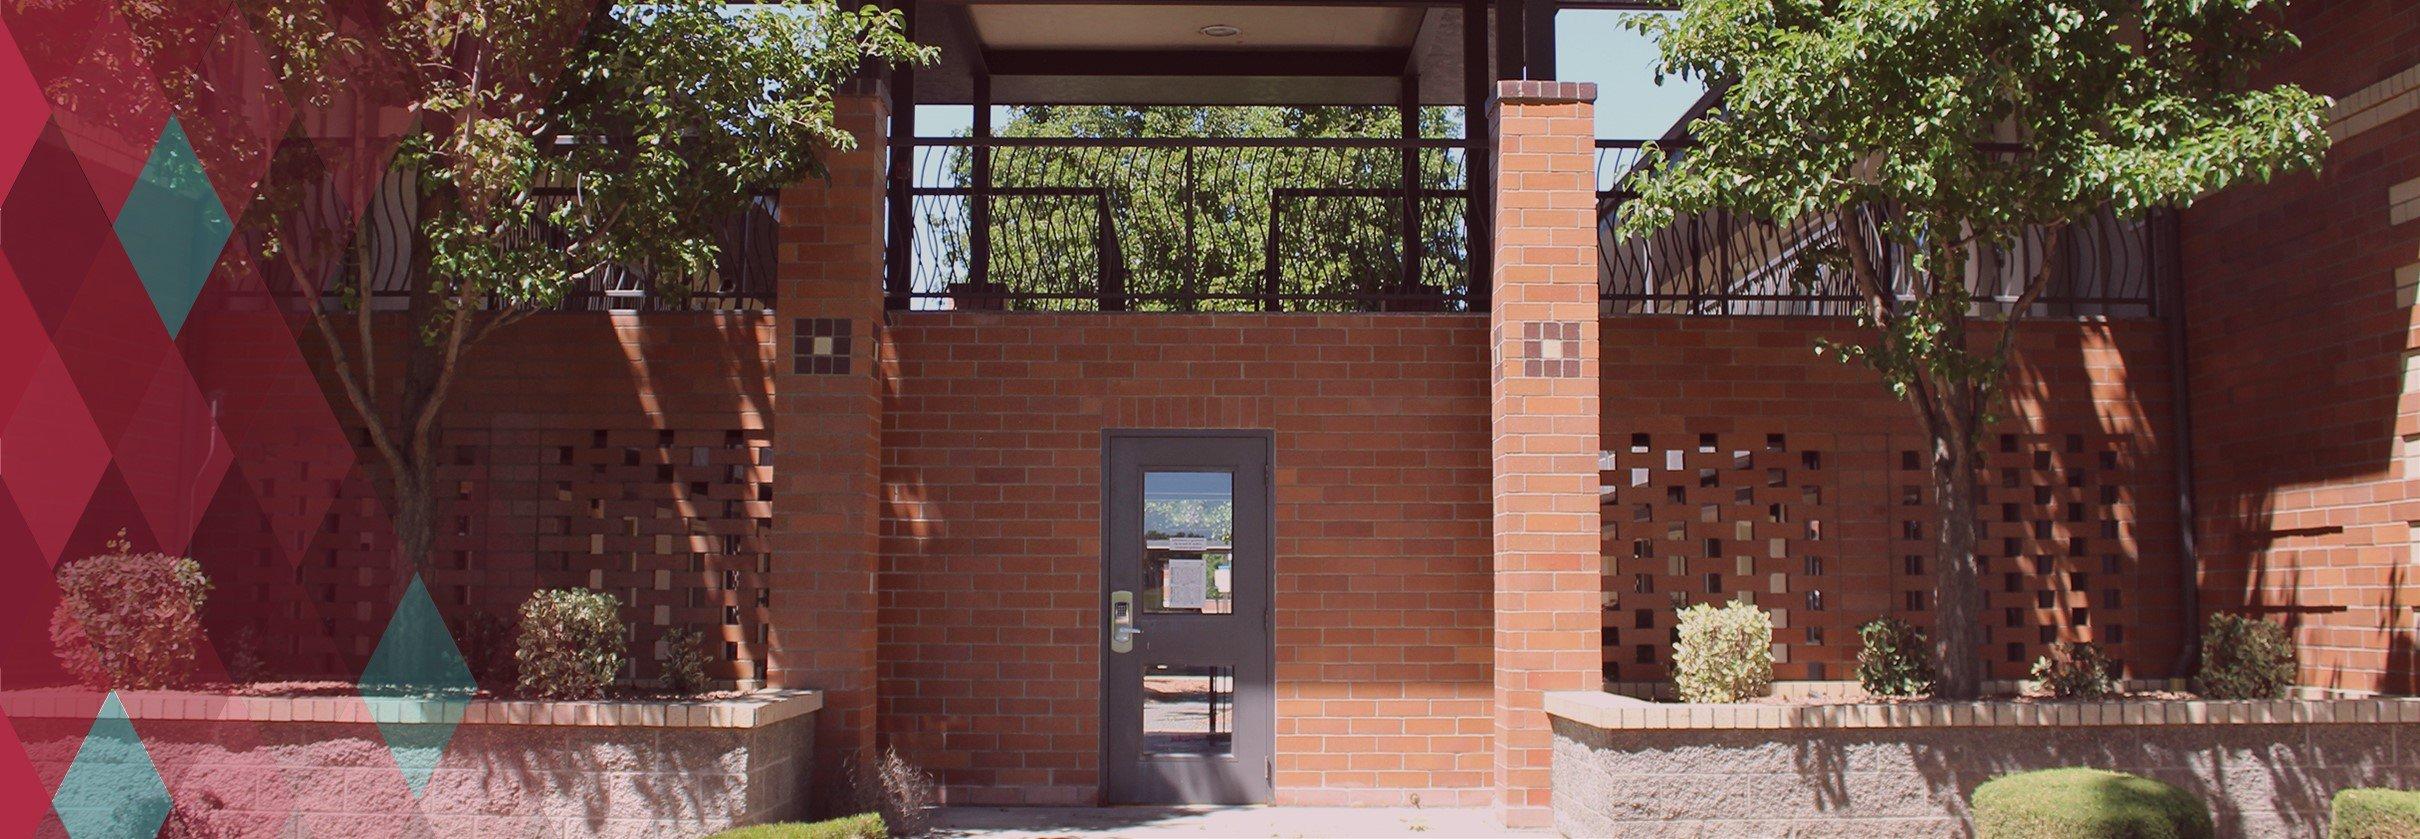 Guest House building